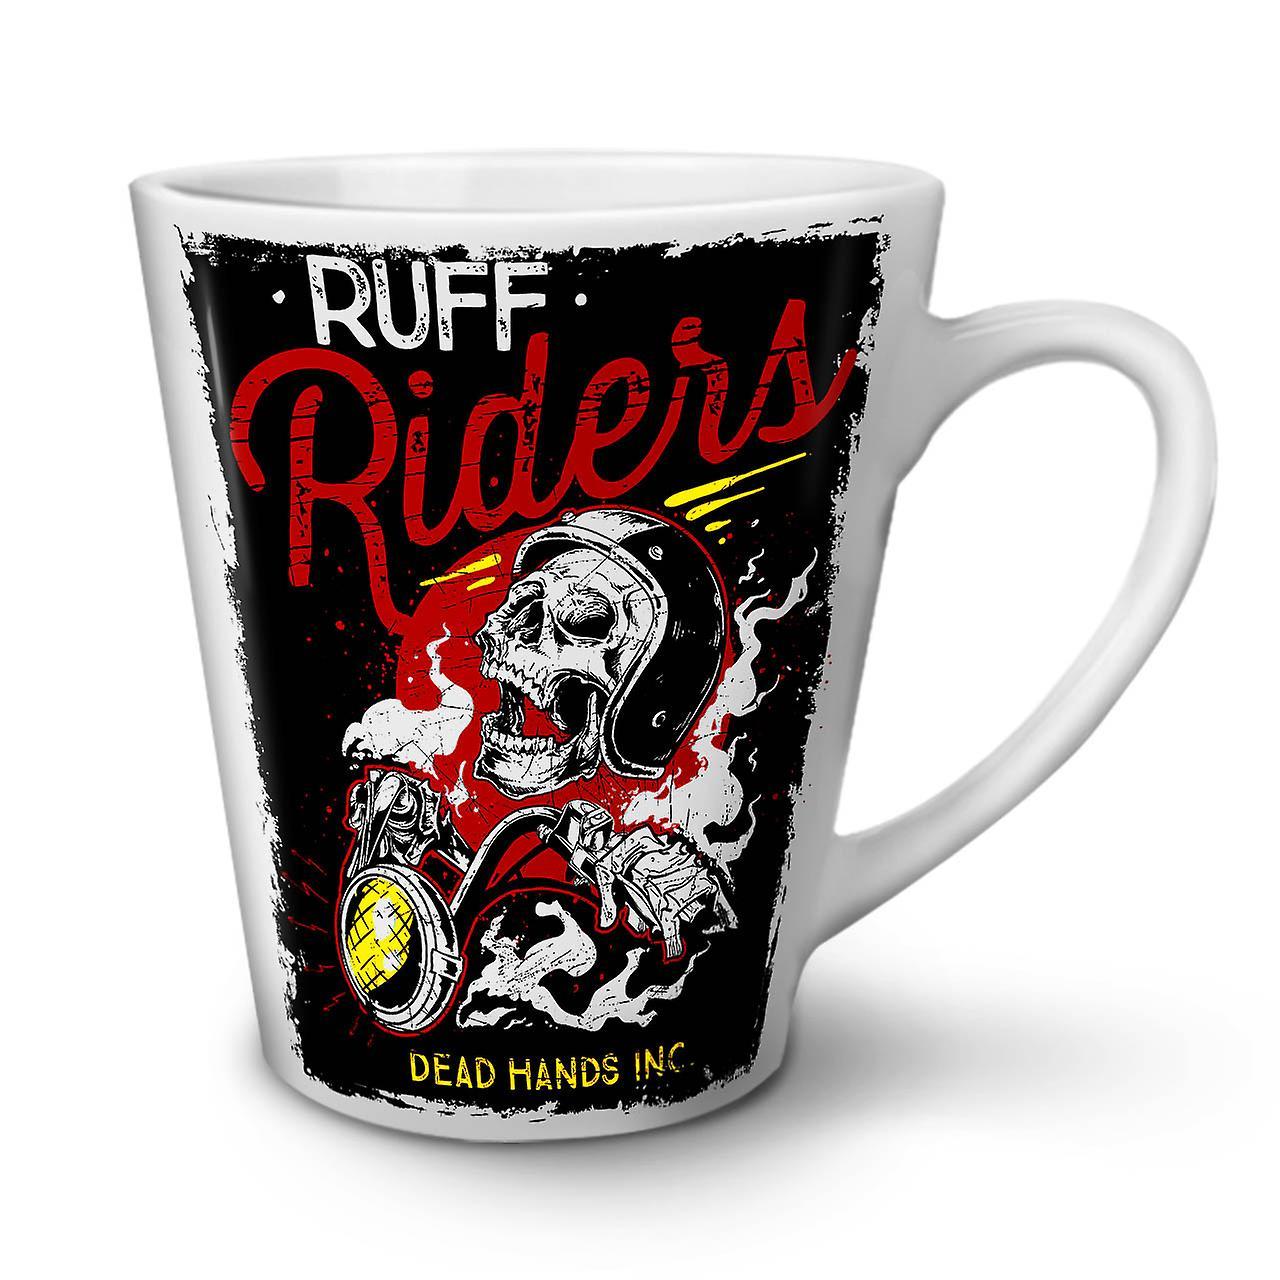 Tasse Café Céramique Skull Riders Nouvelle En OzWellcoda Blanche 12 Ruff Biker Latte lJcTFK1